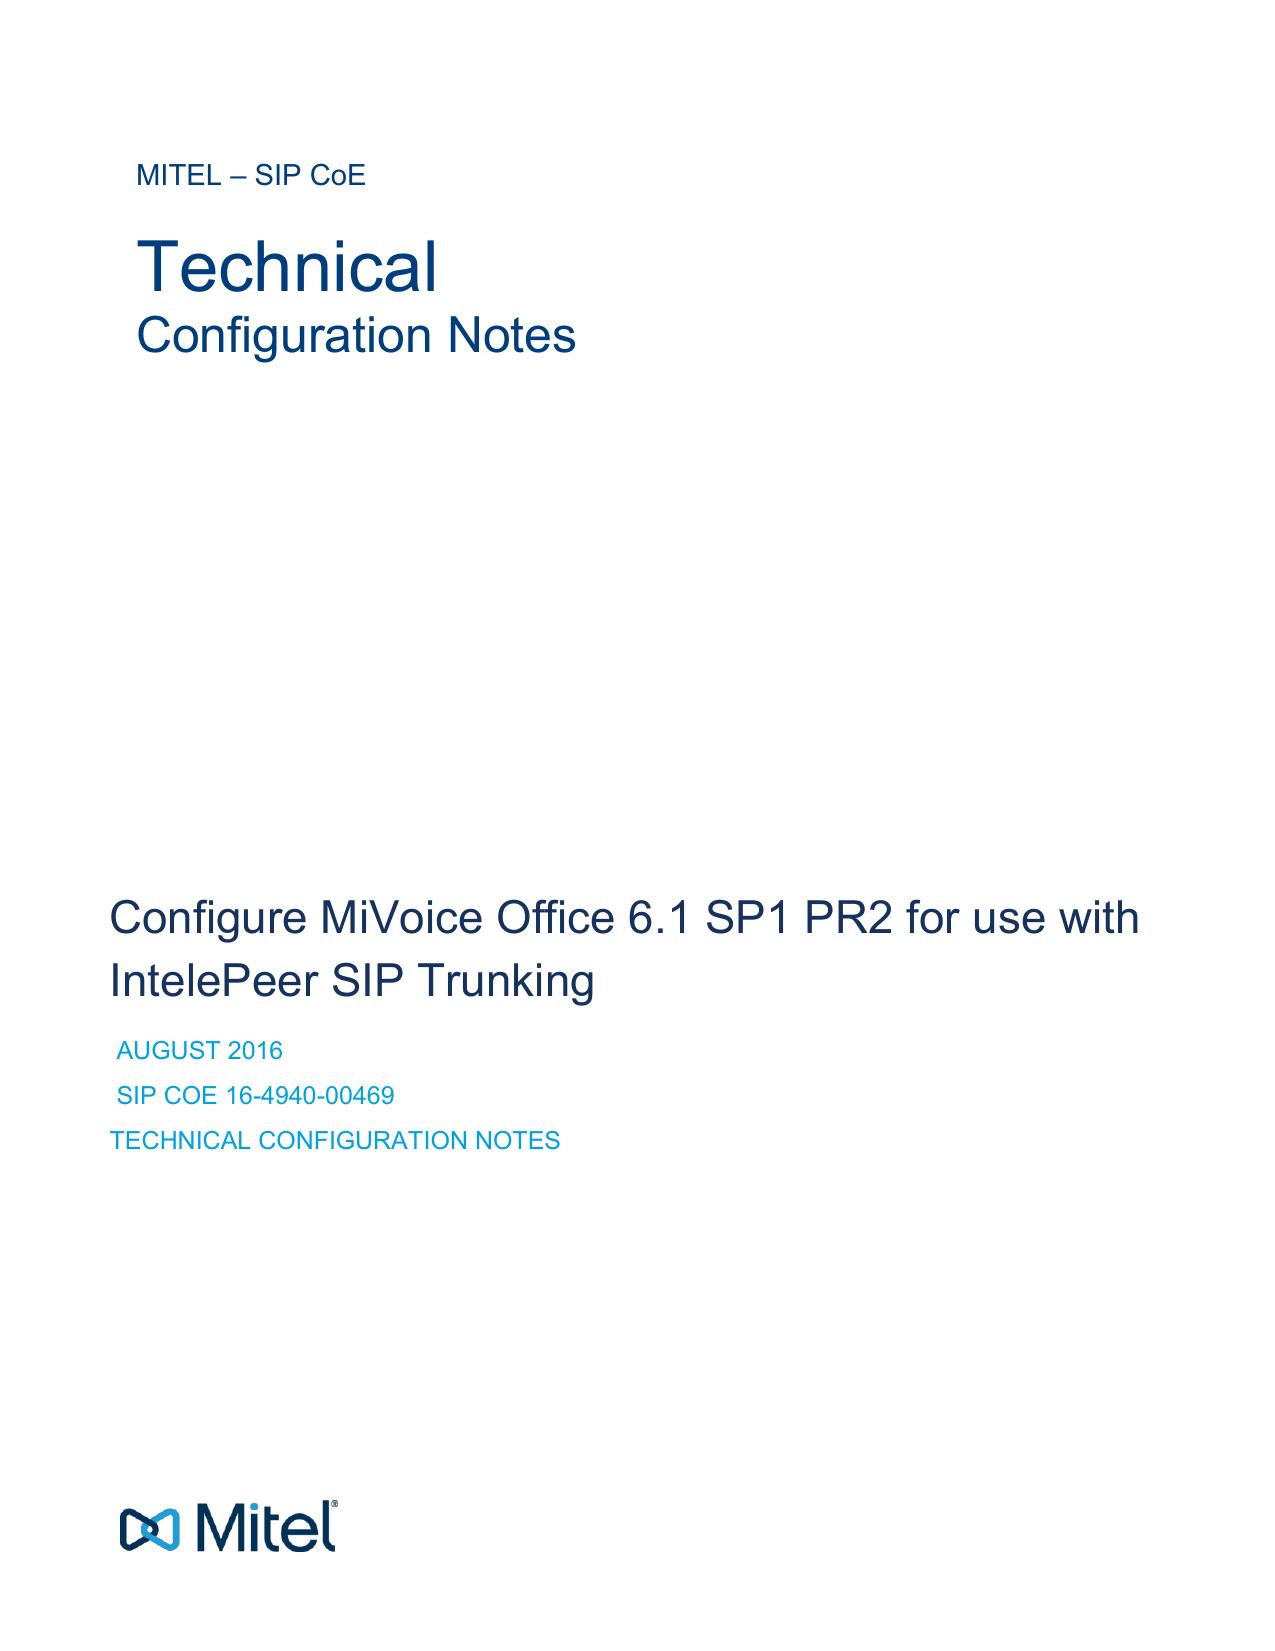 Mitel MiVoice Office 250 Configuration Guide | manualzz com